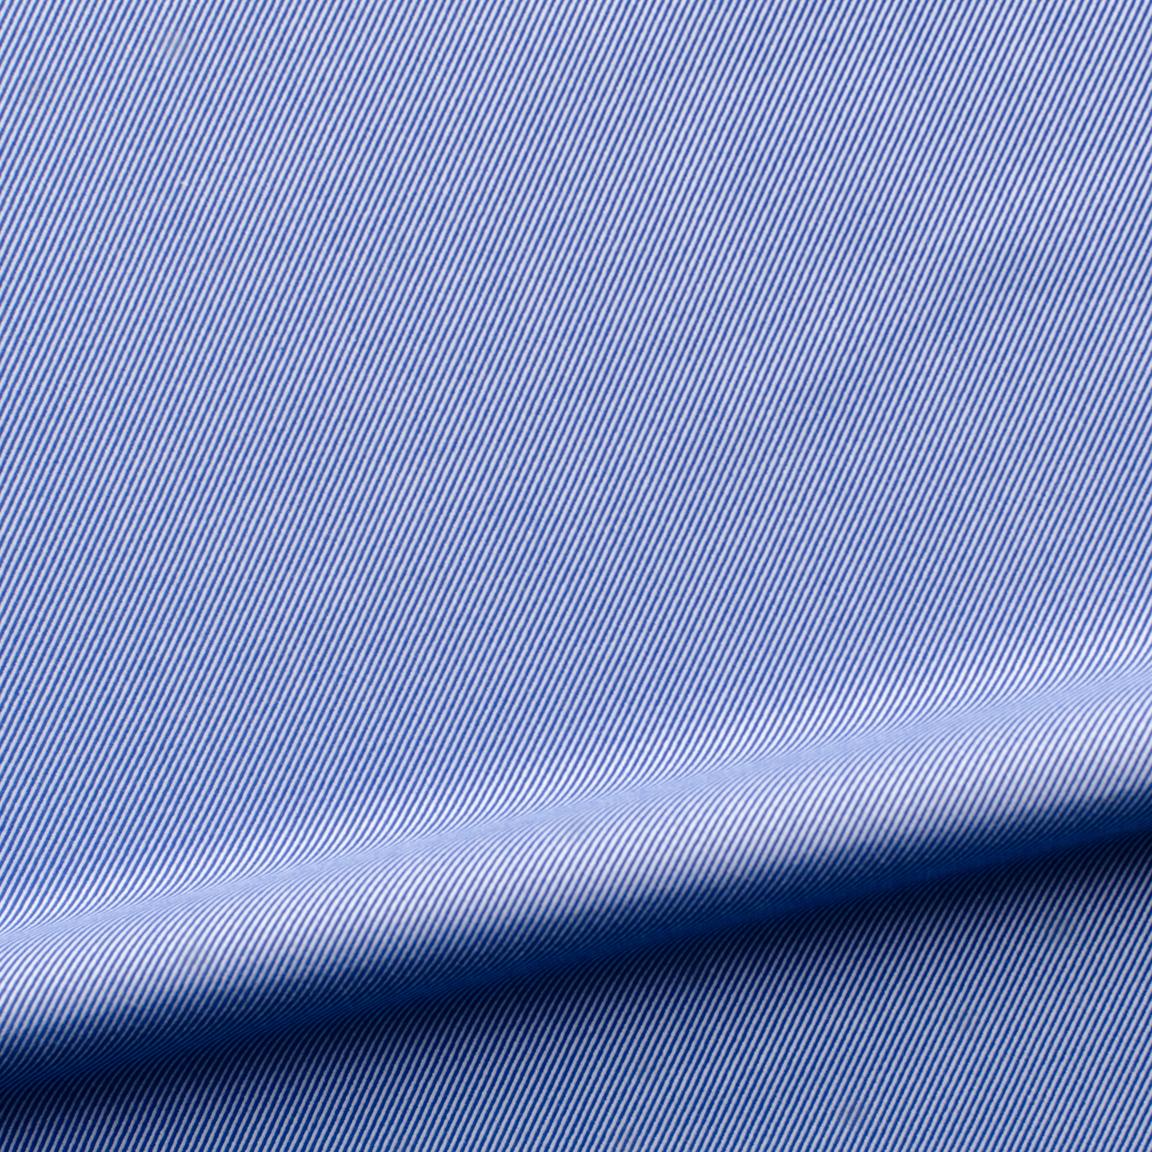 Yale, dark blue